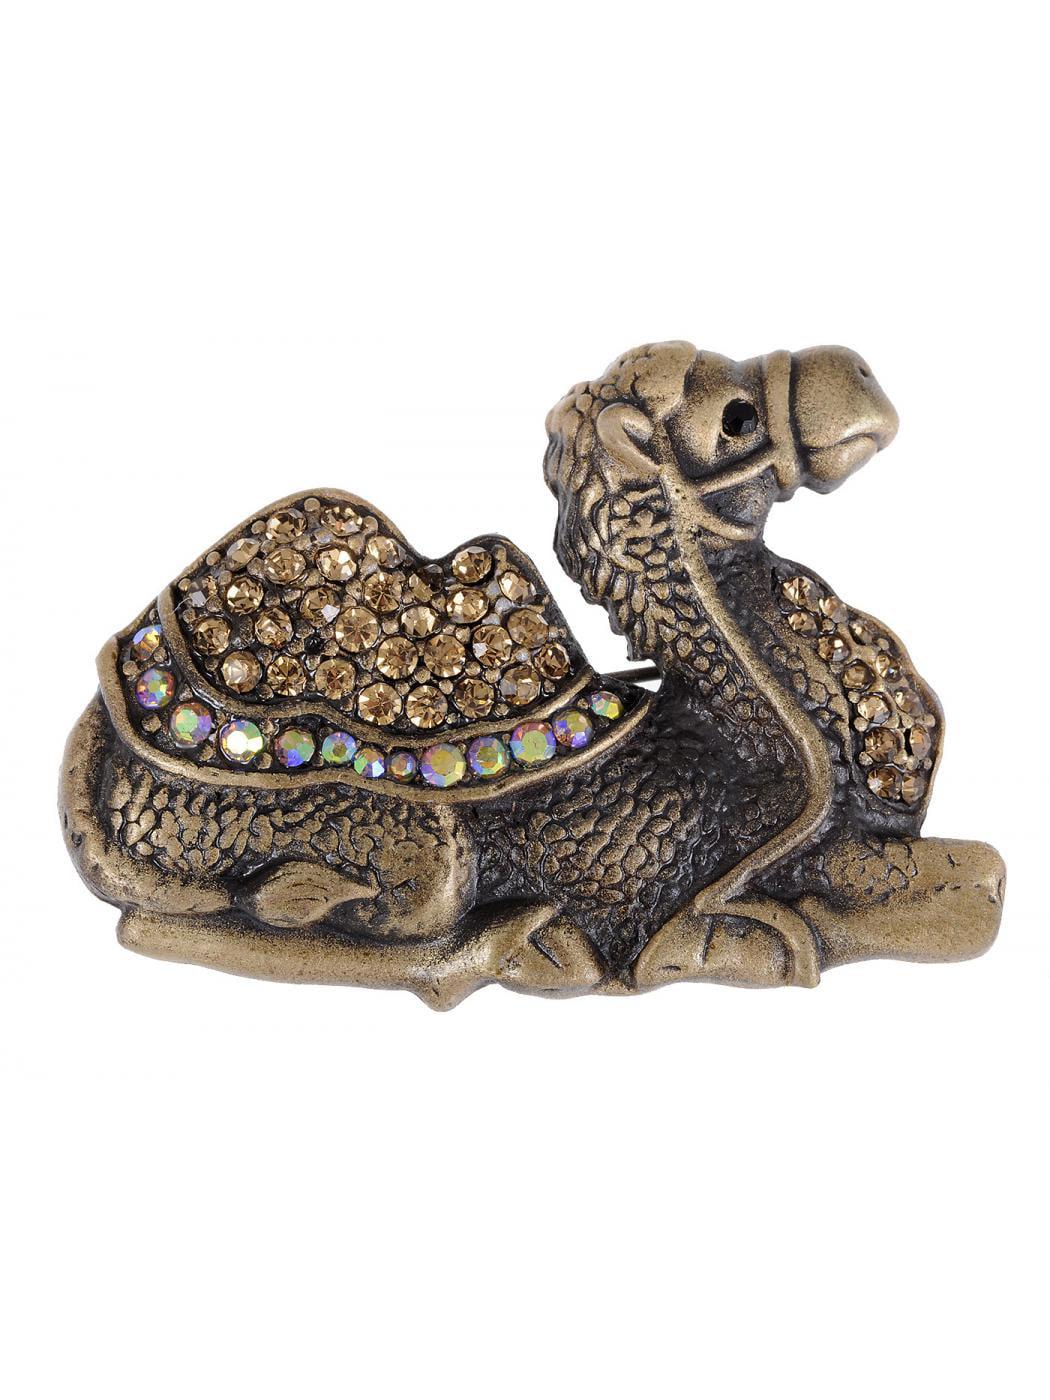 Topaz Crystal Rhinestone Camel Chillin' Smokey Light Animal Brooch Costume Pin by